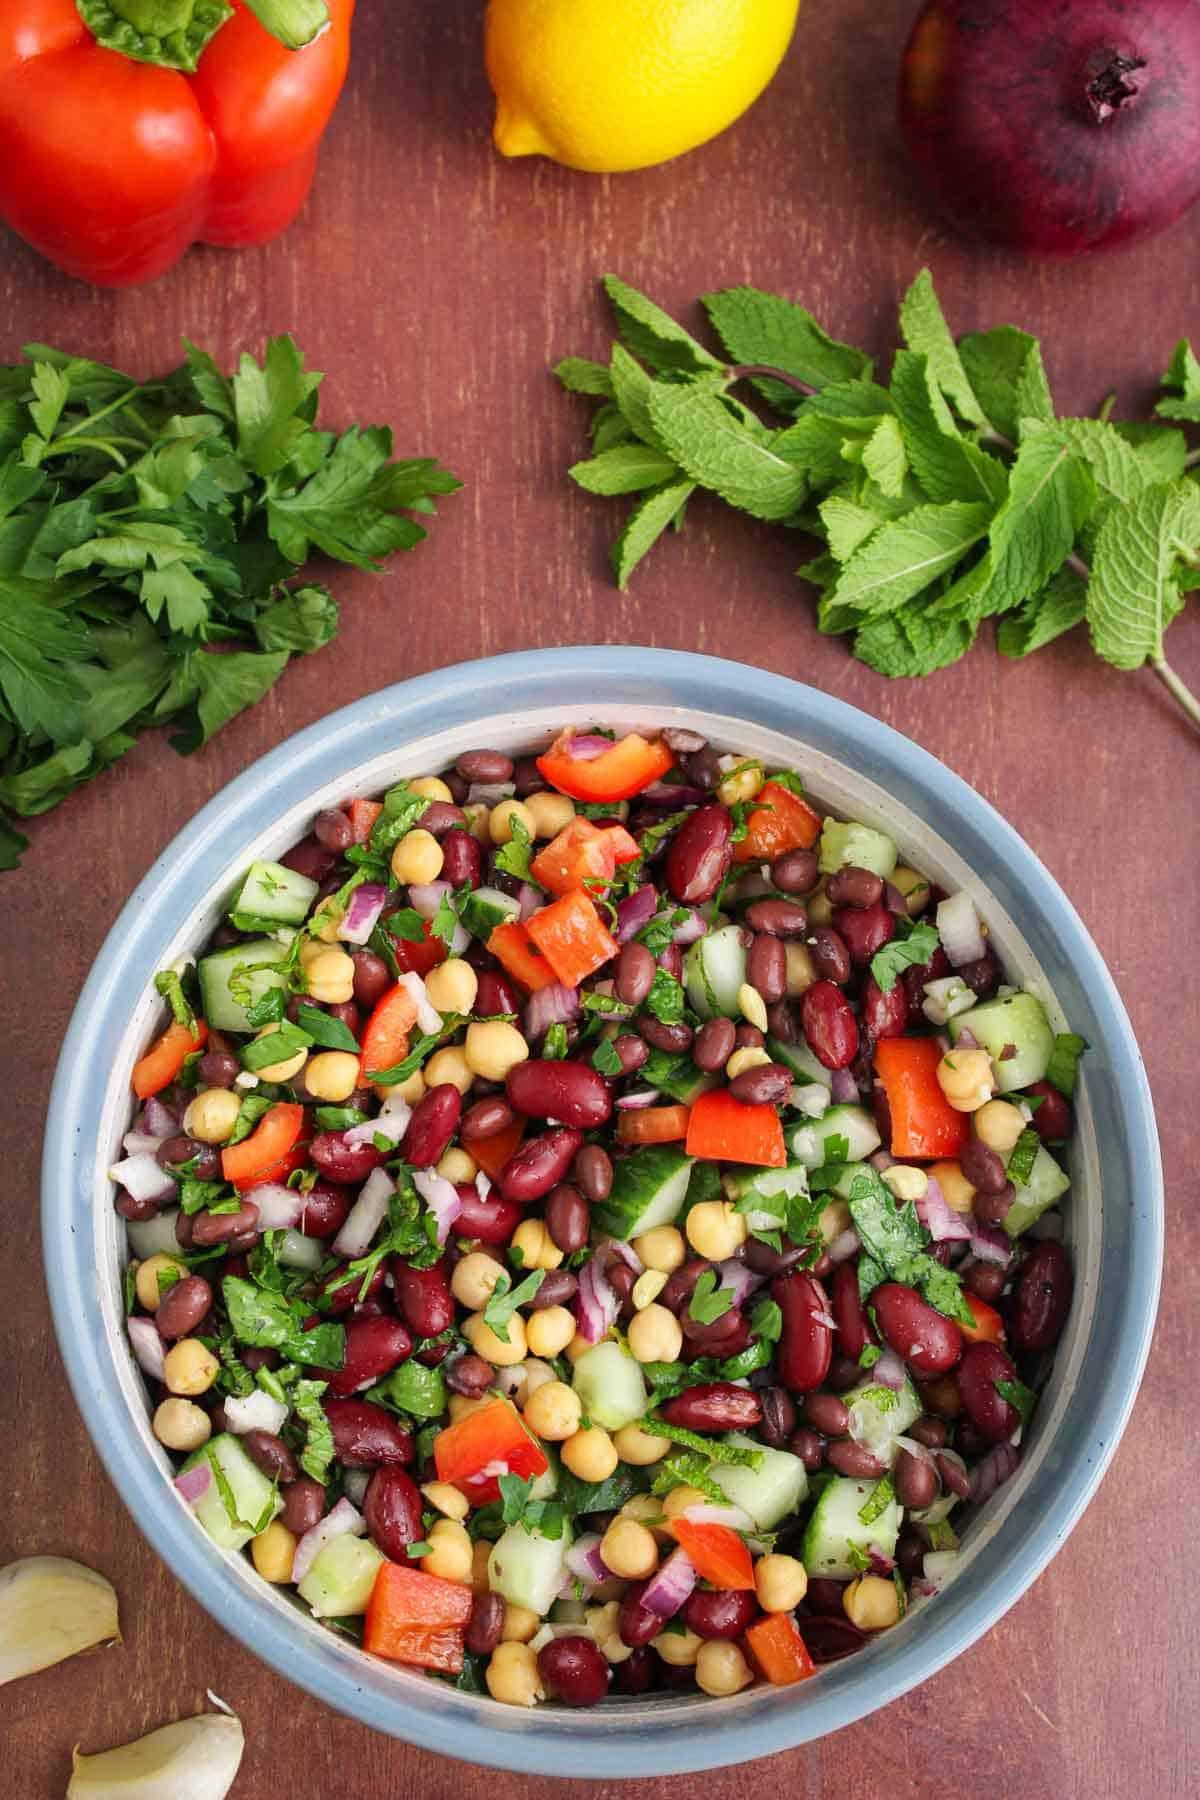 Vegan Three-Bean Salad Overhead Shot with Lemon, Mint and Parsley